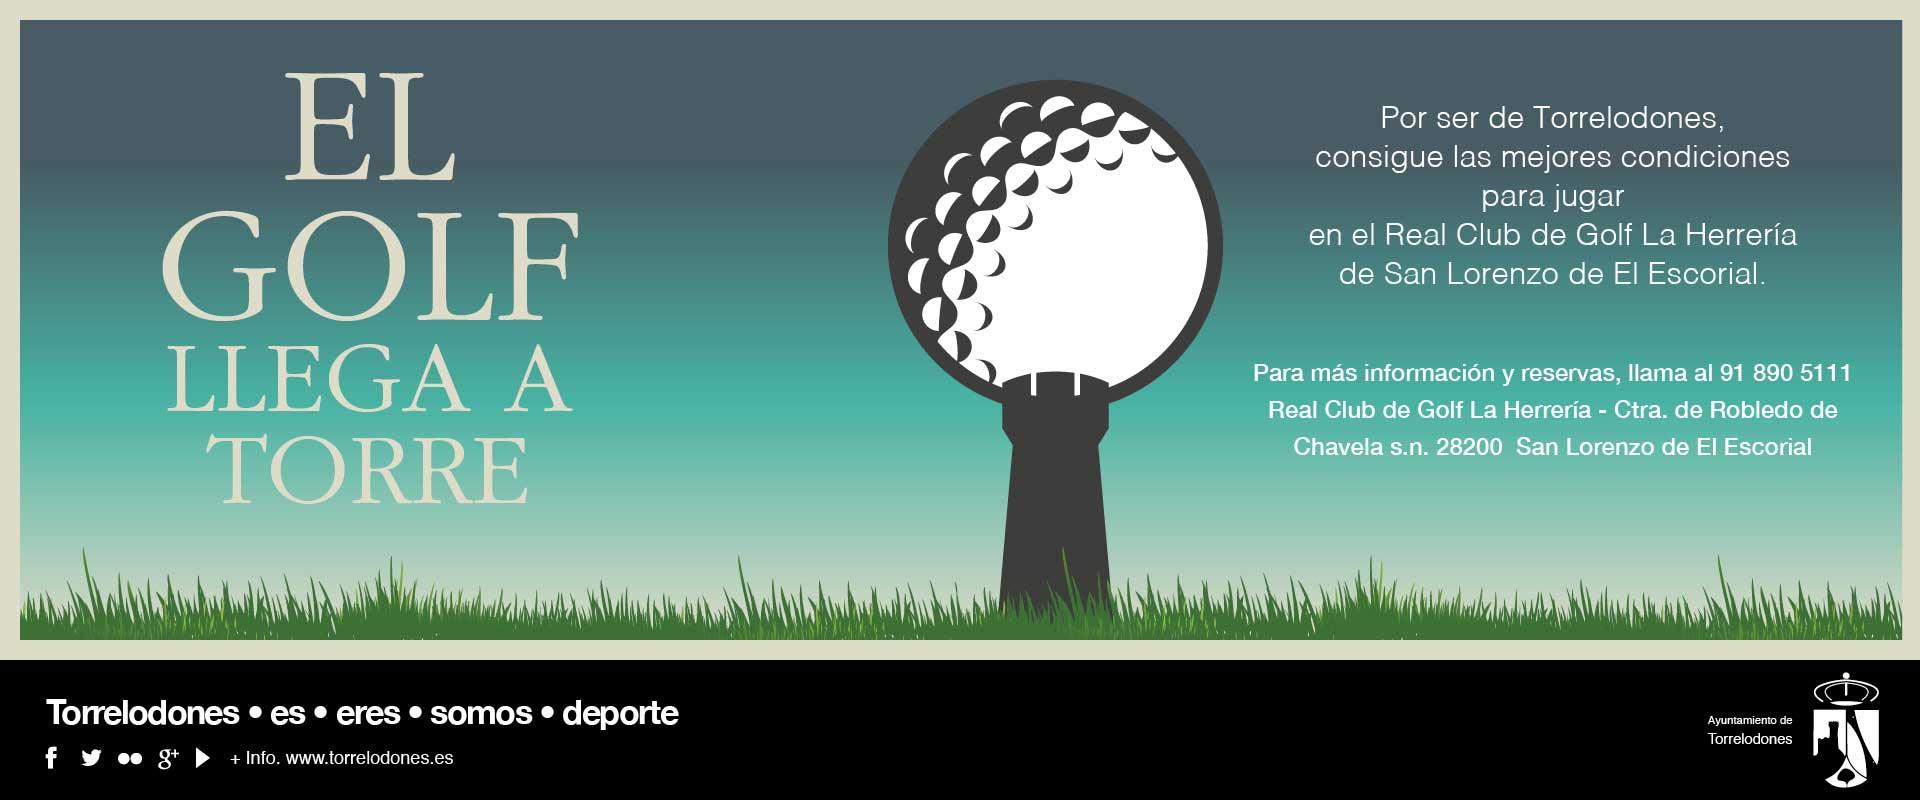 slider-golf-herreria